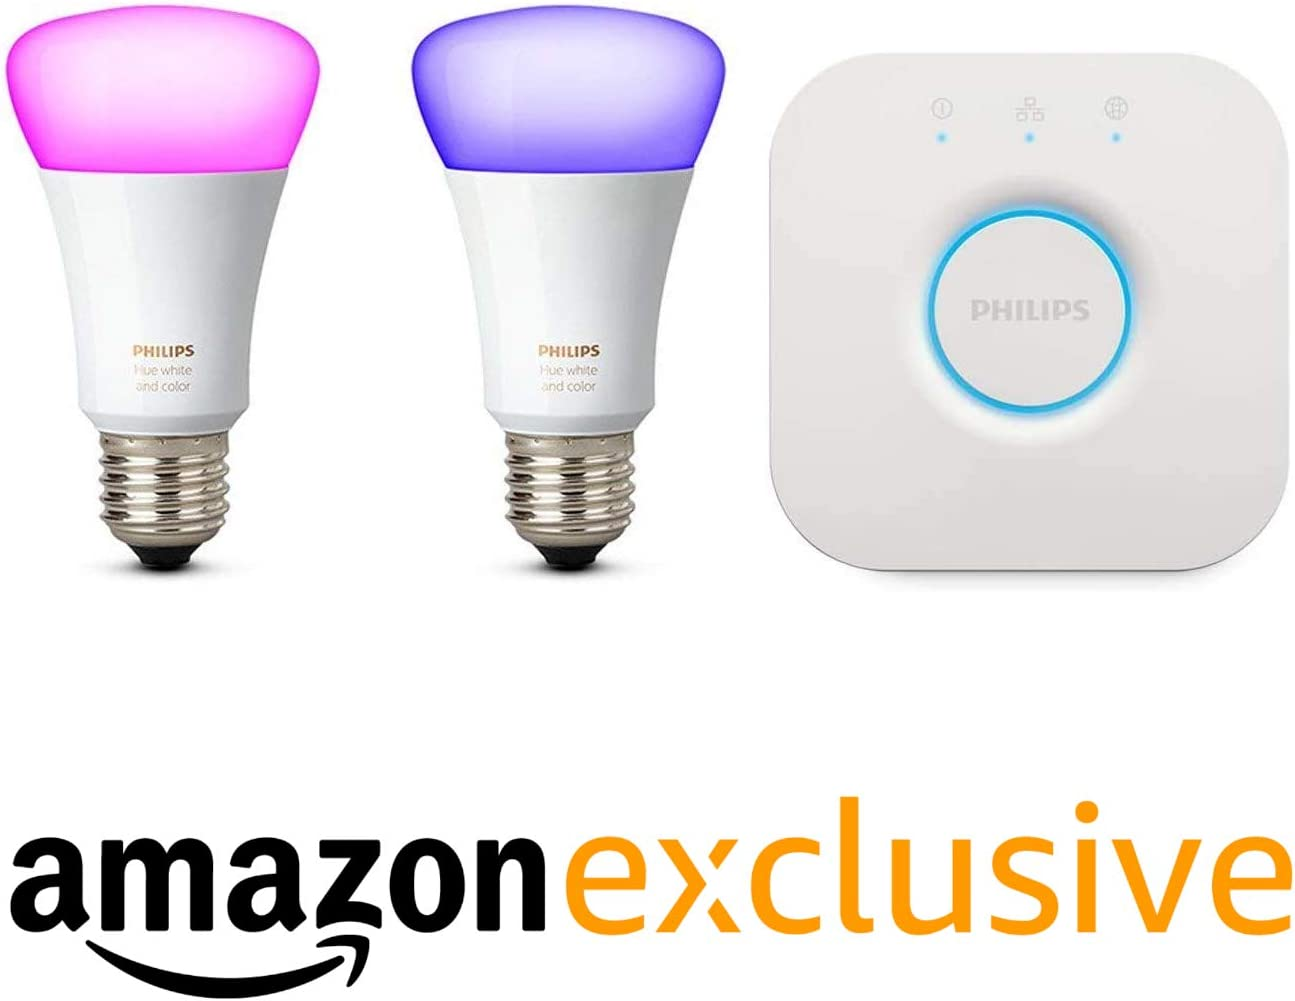 Philips Hue White and Color Ambiance Pack de 3 Bombillas LED inteligentes E27, puente de conexión y 2 Smart Buttons + Philips Hue - Sensor de movimiento controlable vía WiFi: Amazon.es: Iluminación